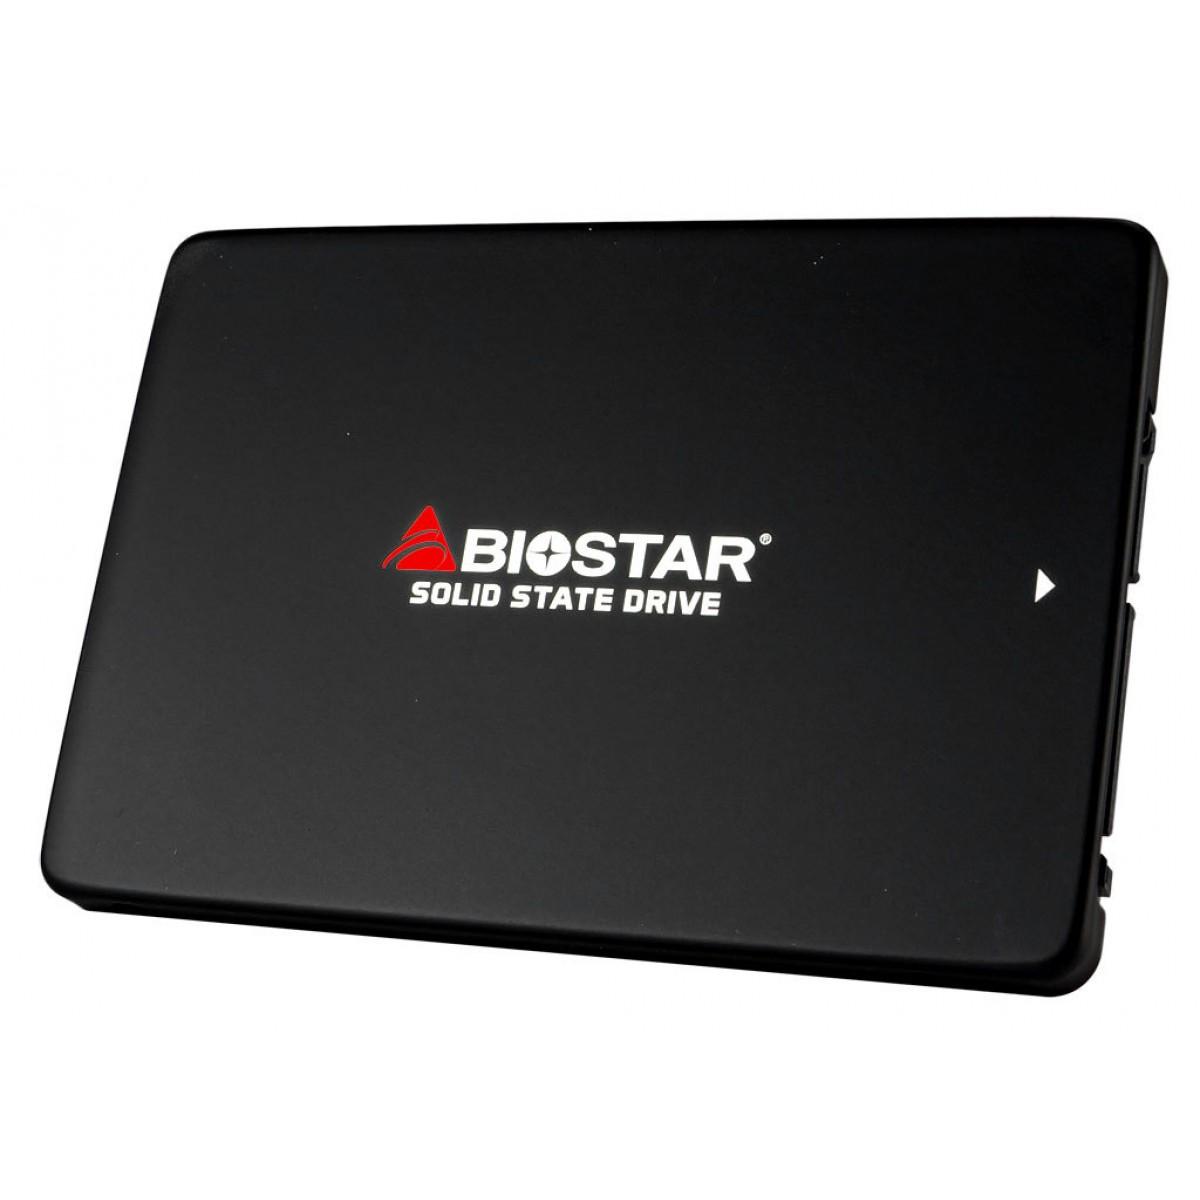 SSD Biostar S100 240GB, Sata III, Leitura 530MBs Gravação 410MBs, SM120S2E32-PM1BH-BS2